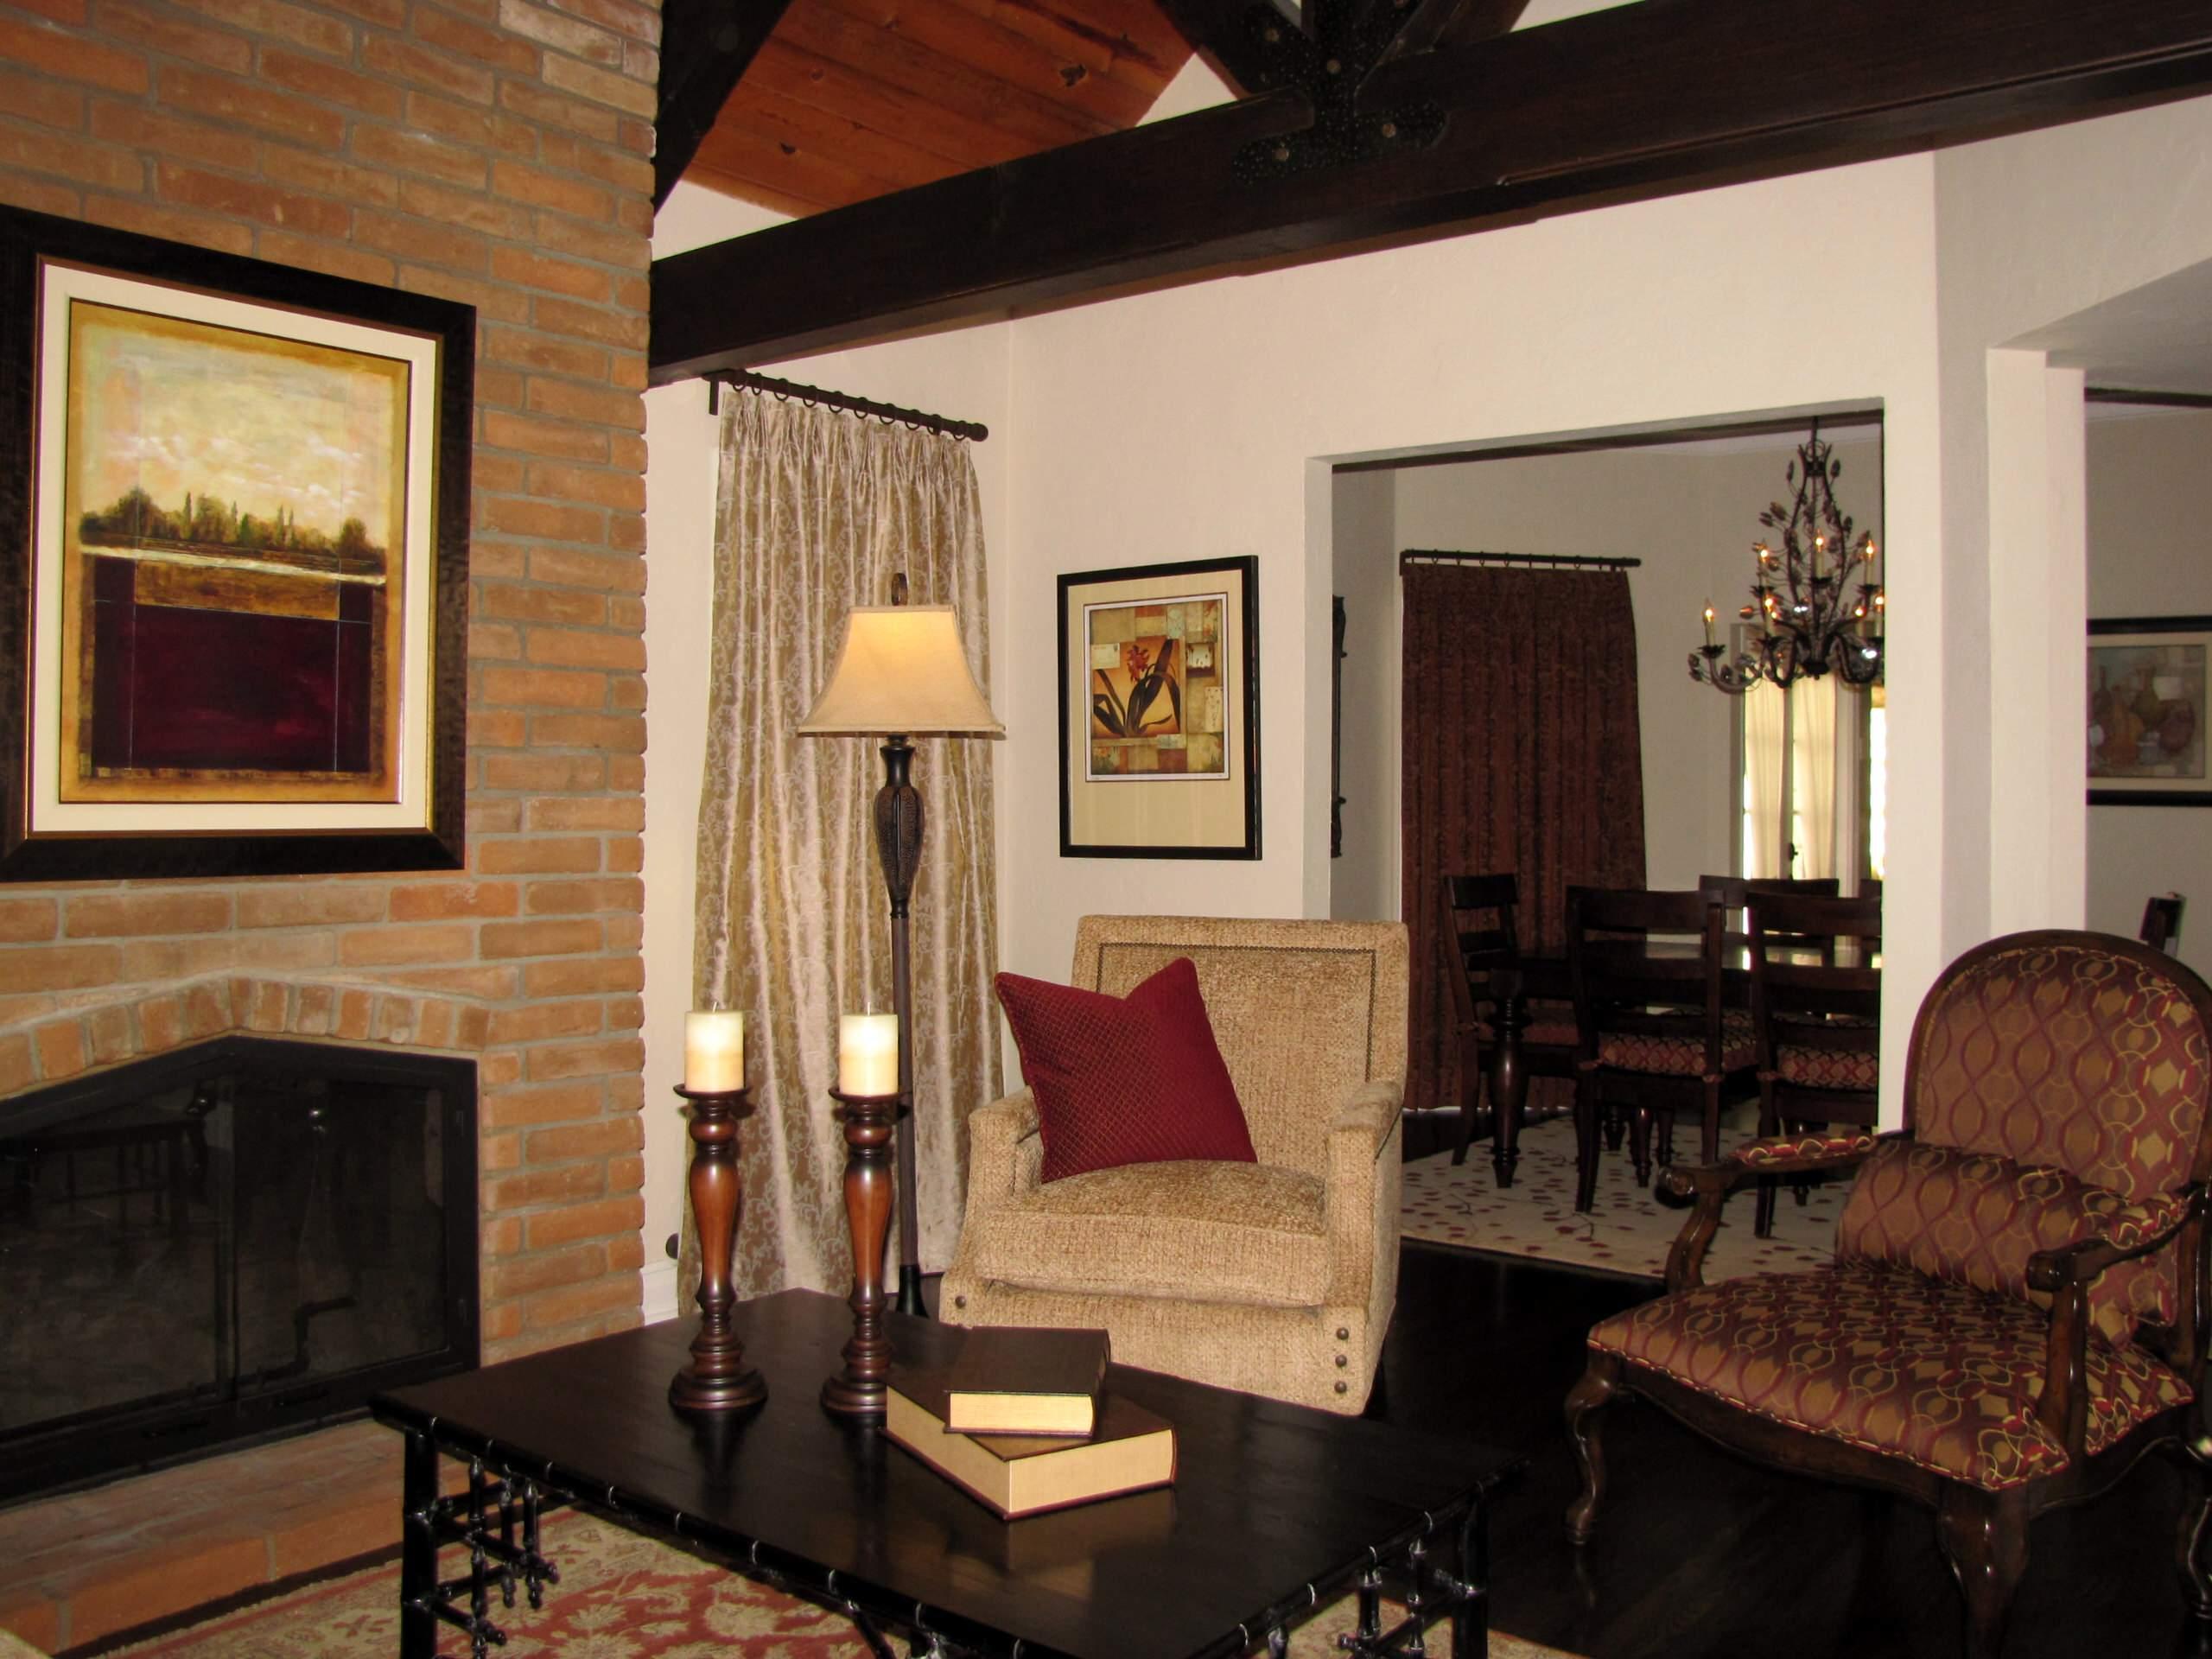 An Eclectic Home in Manhattan Beach